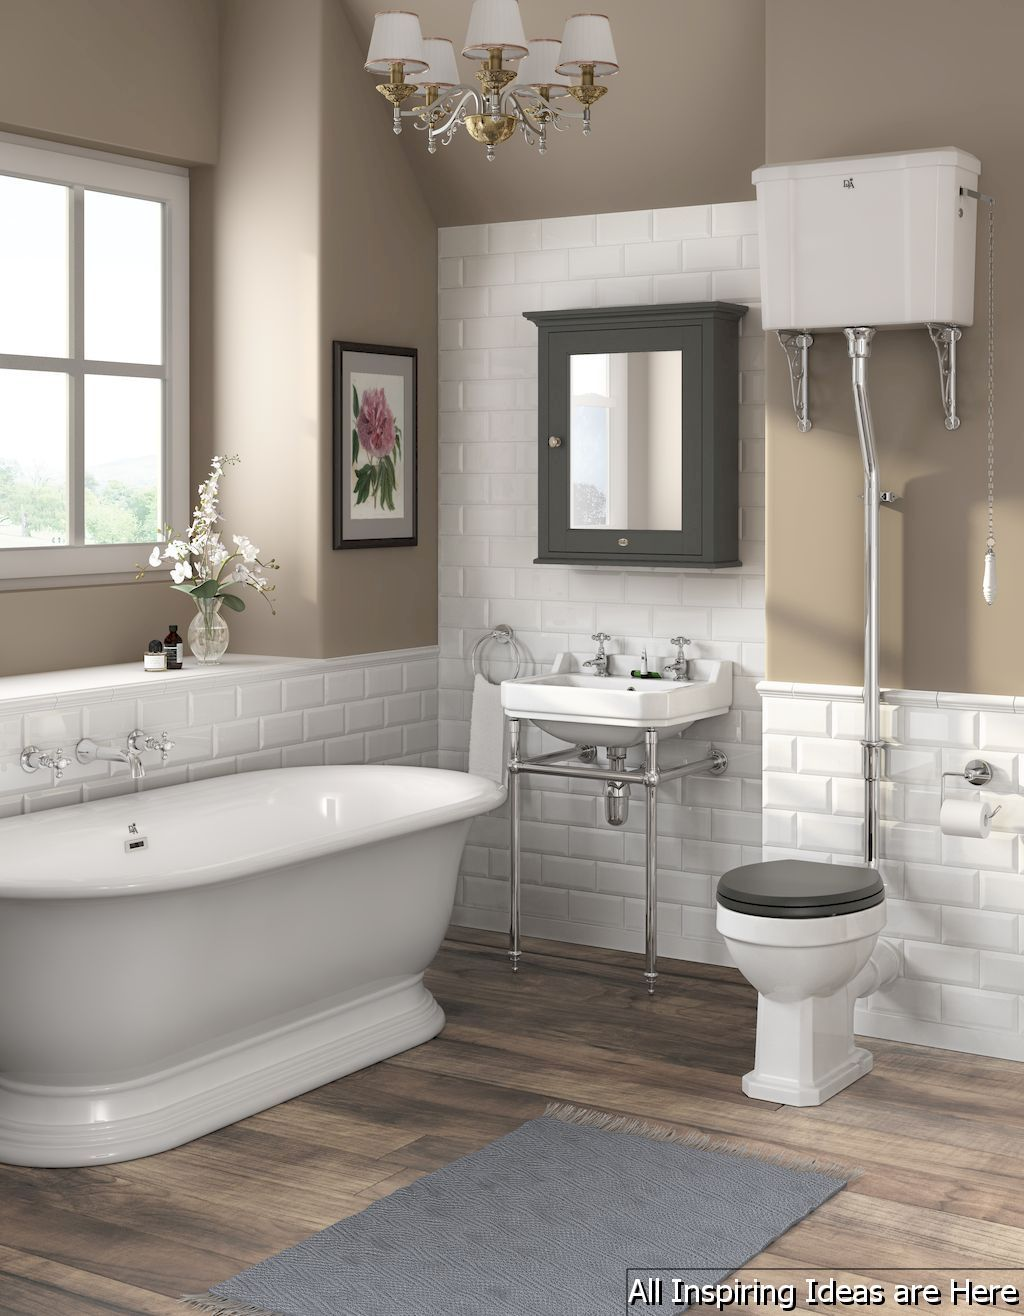 40 Minimalist Modern Farmhouse Small Bathroom Decor